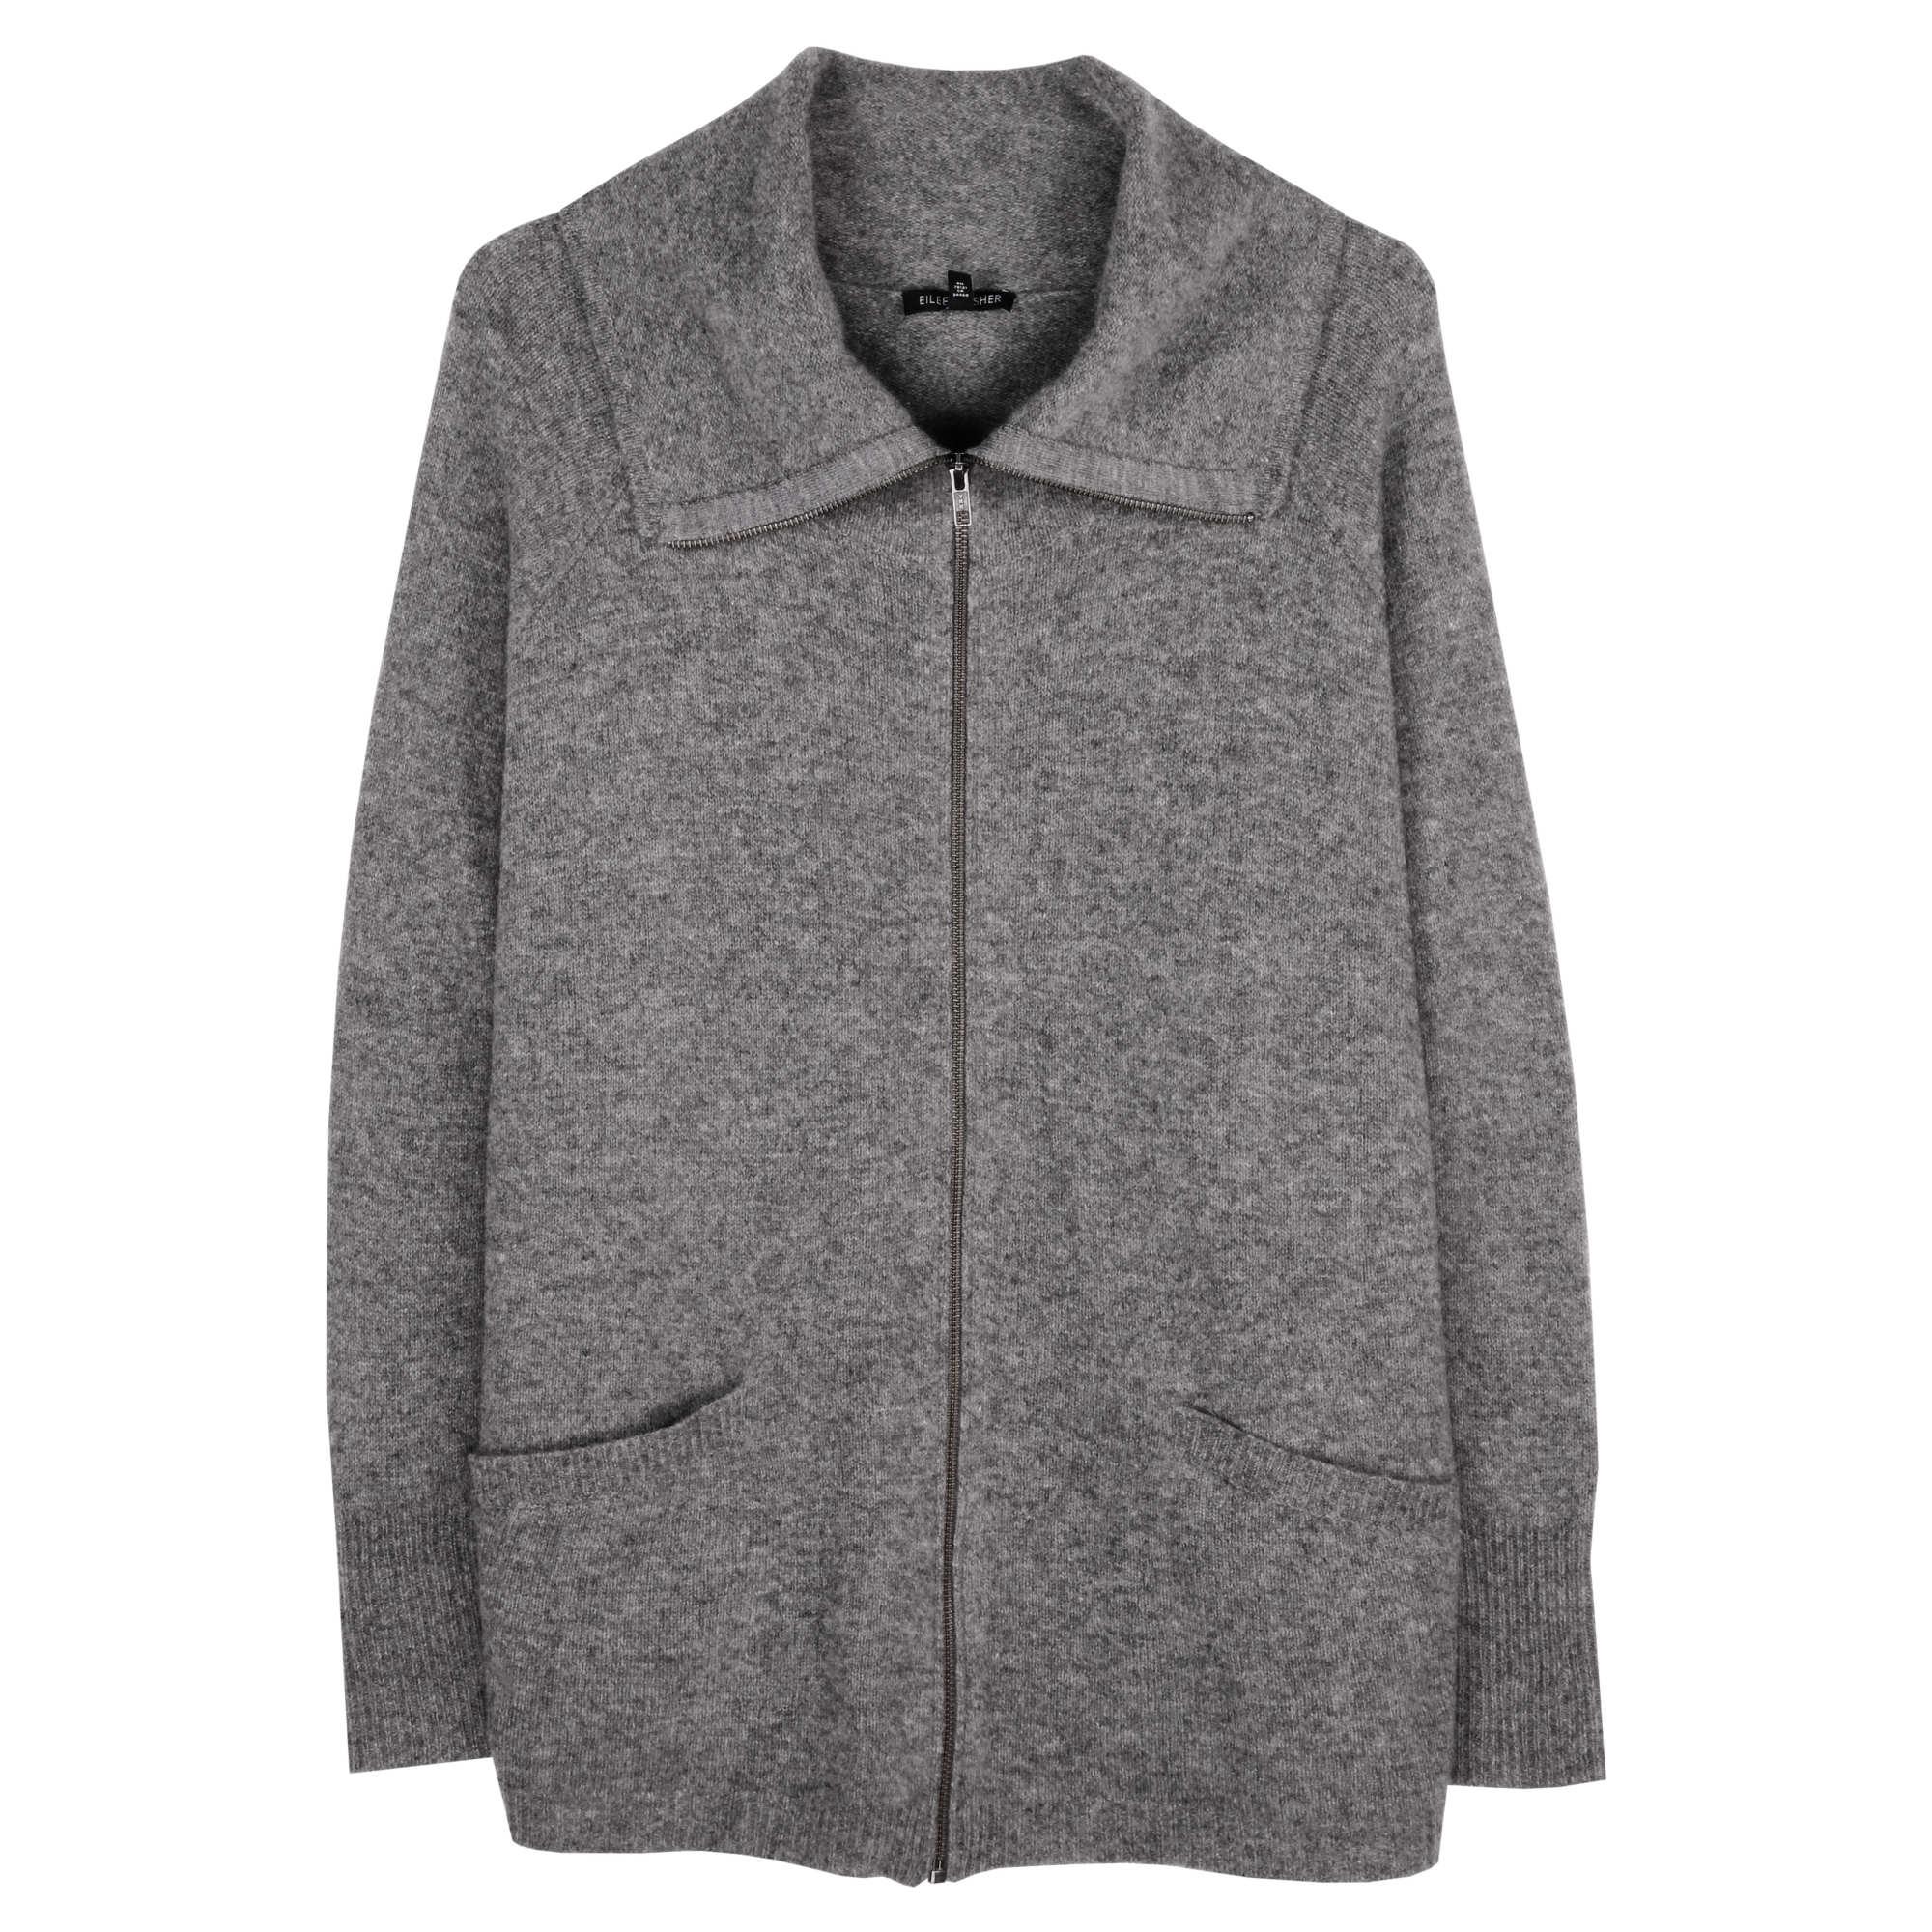 Felted Merino Lambswool Jacket